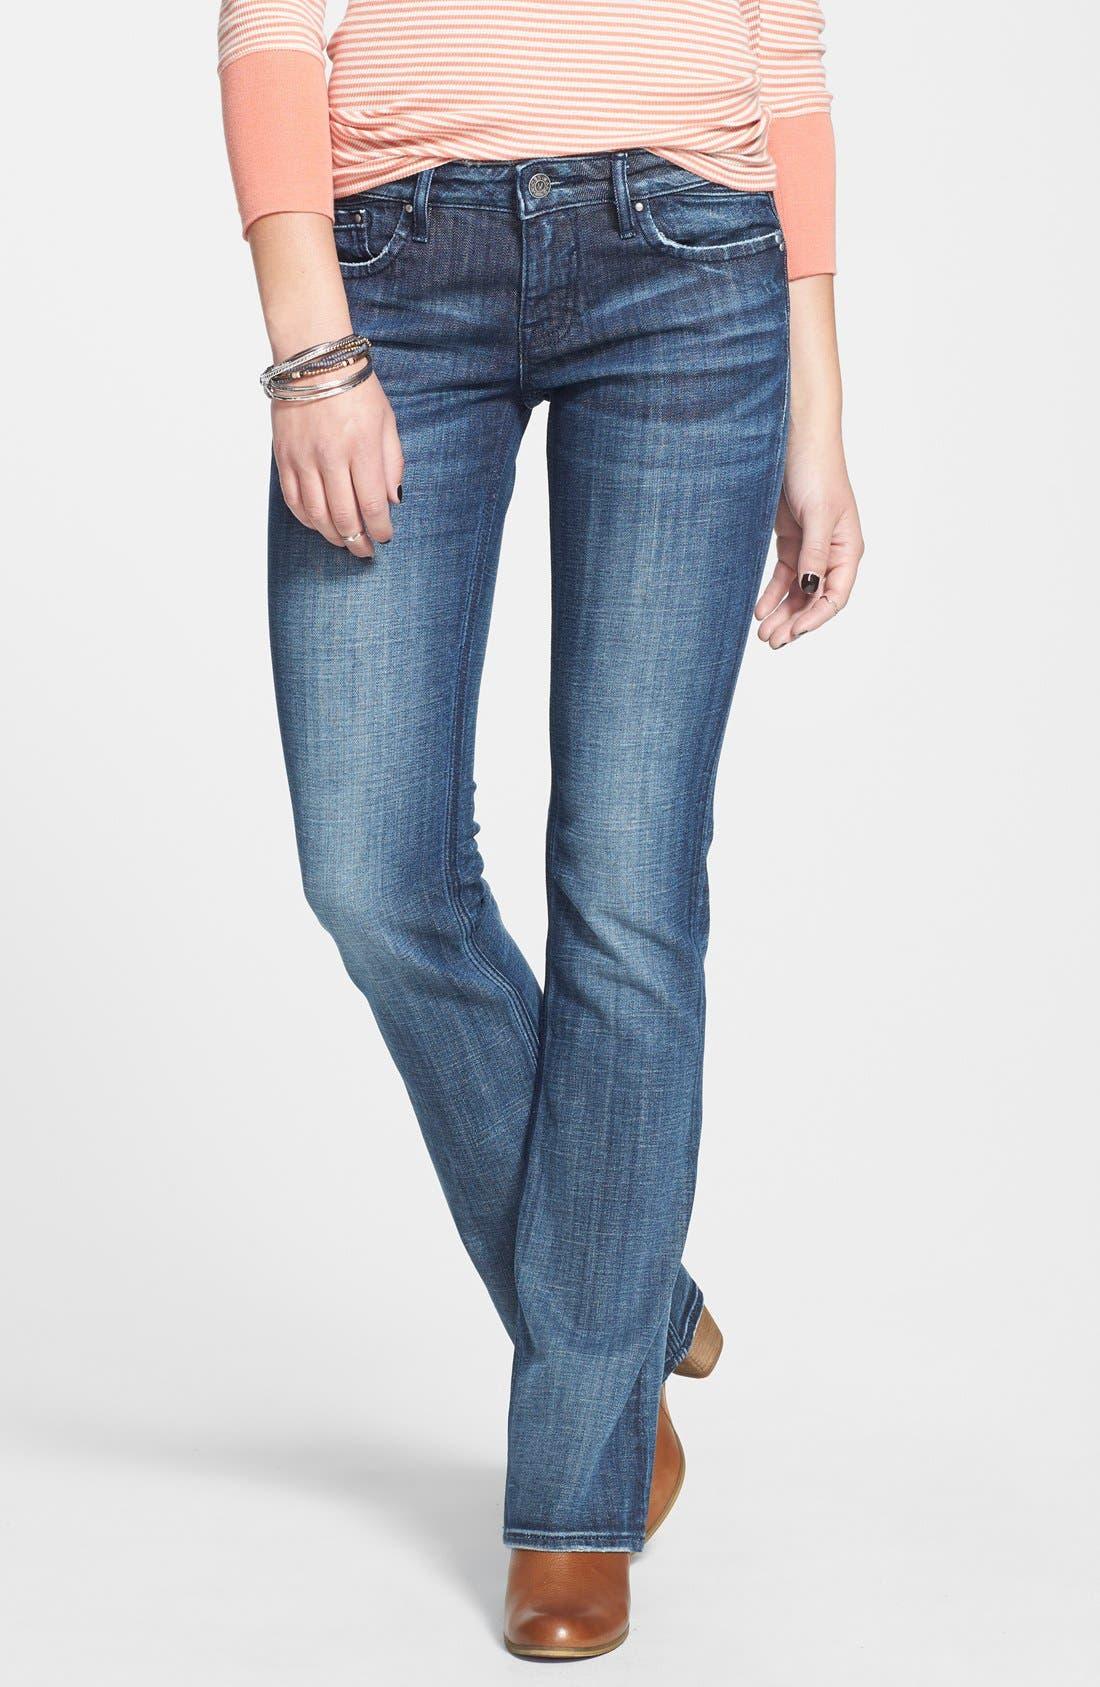 Alternate Image 1 Selected - Vigoss 'Chelsea' Bootcut Jeans